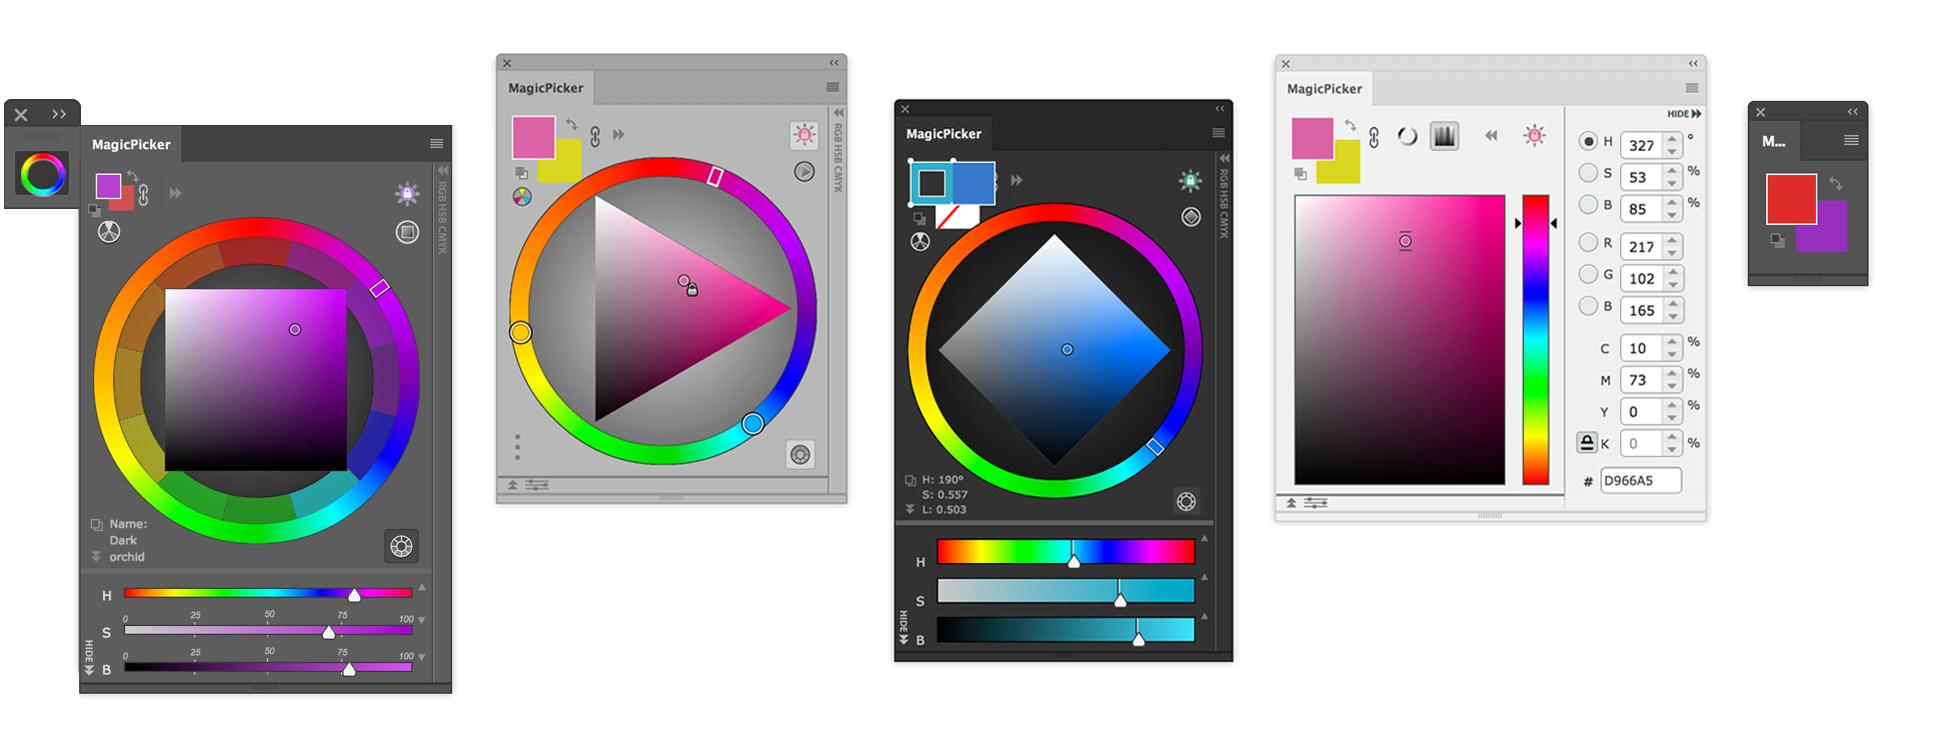 Features of MagicPicker color wheel for Photoshop CC CS6 CS5